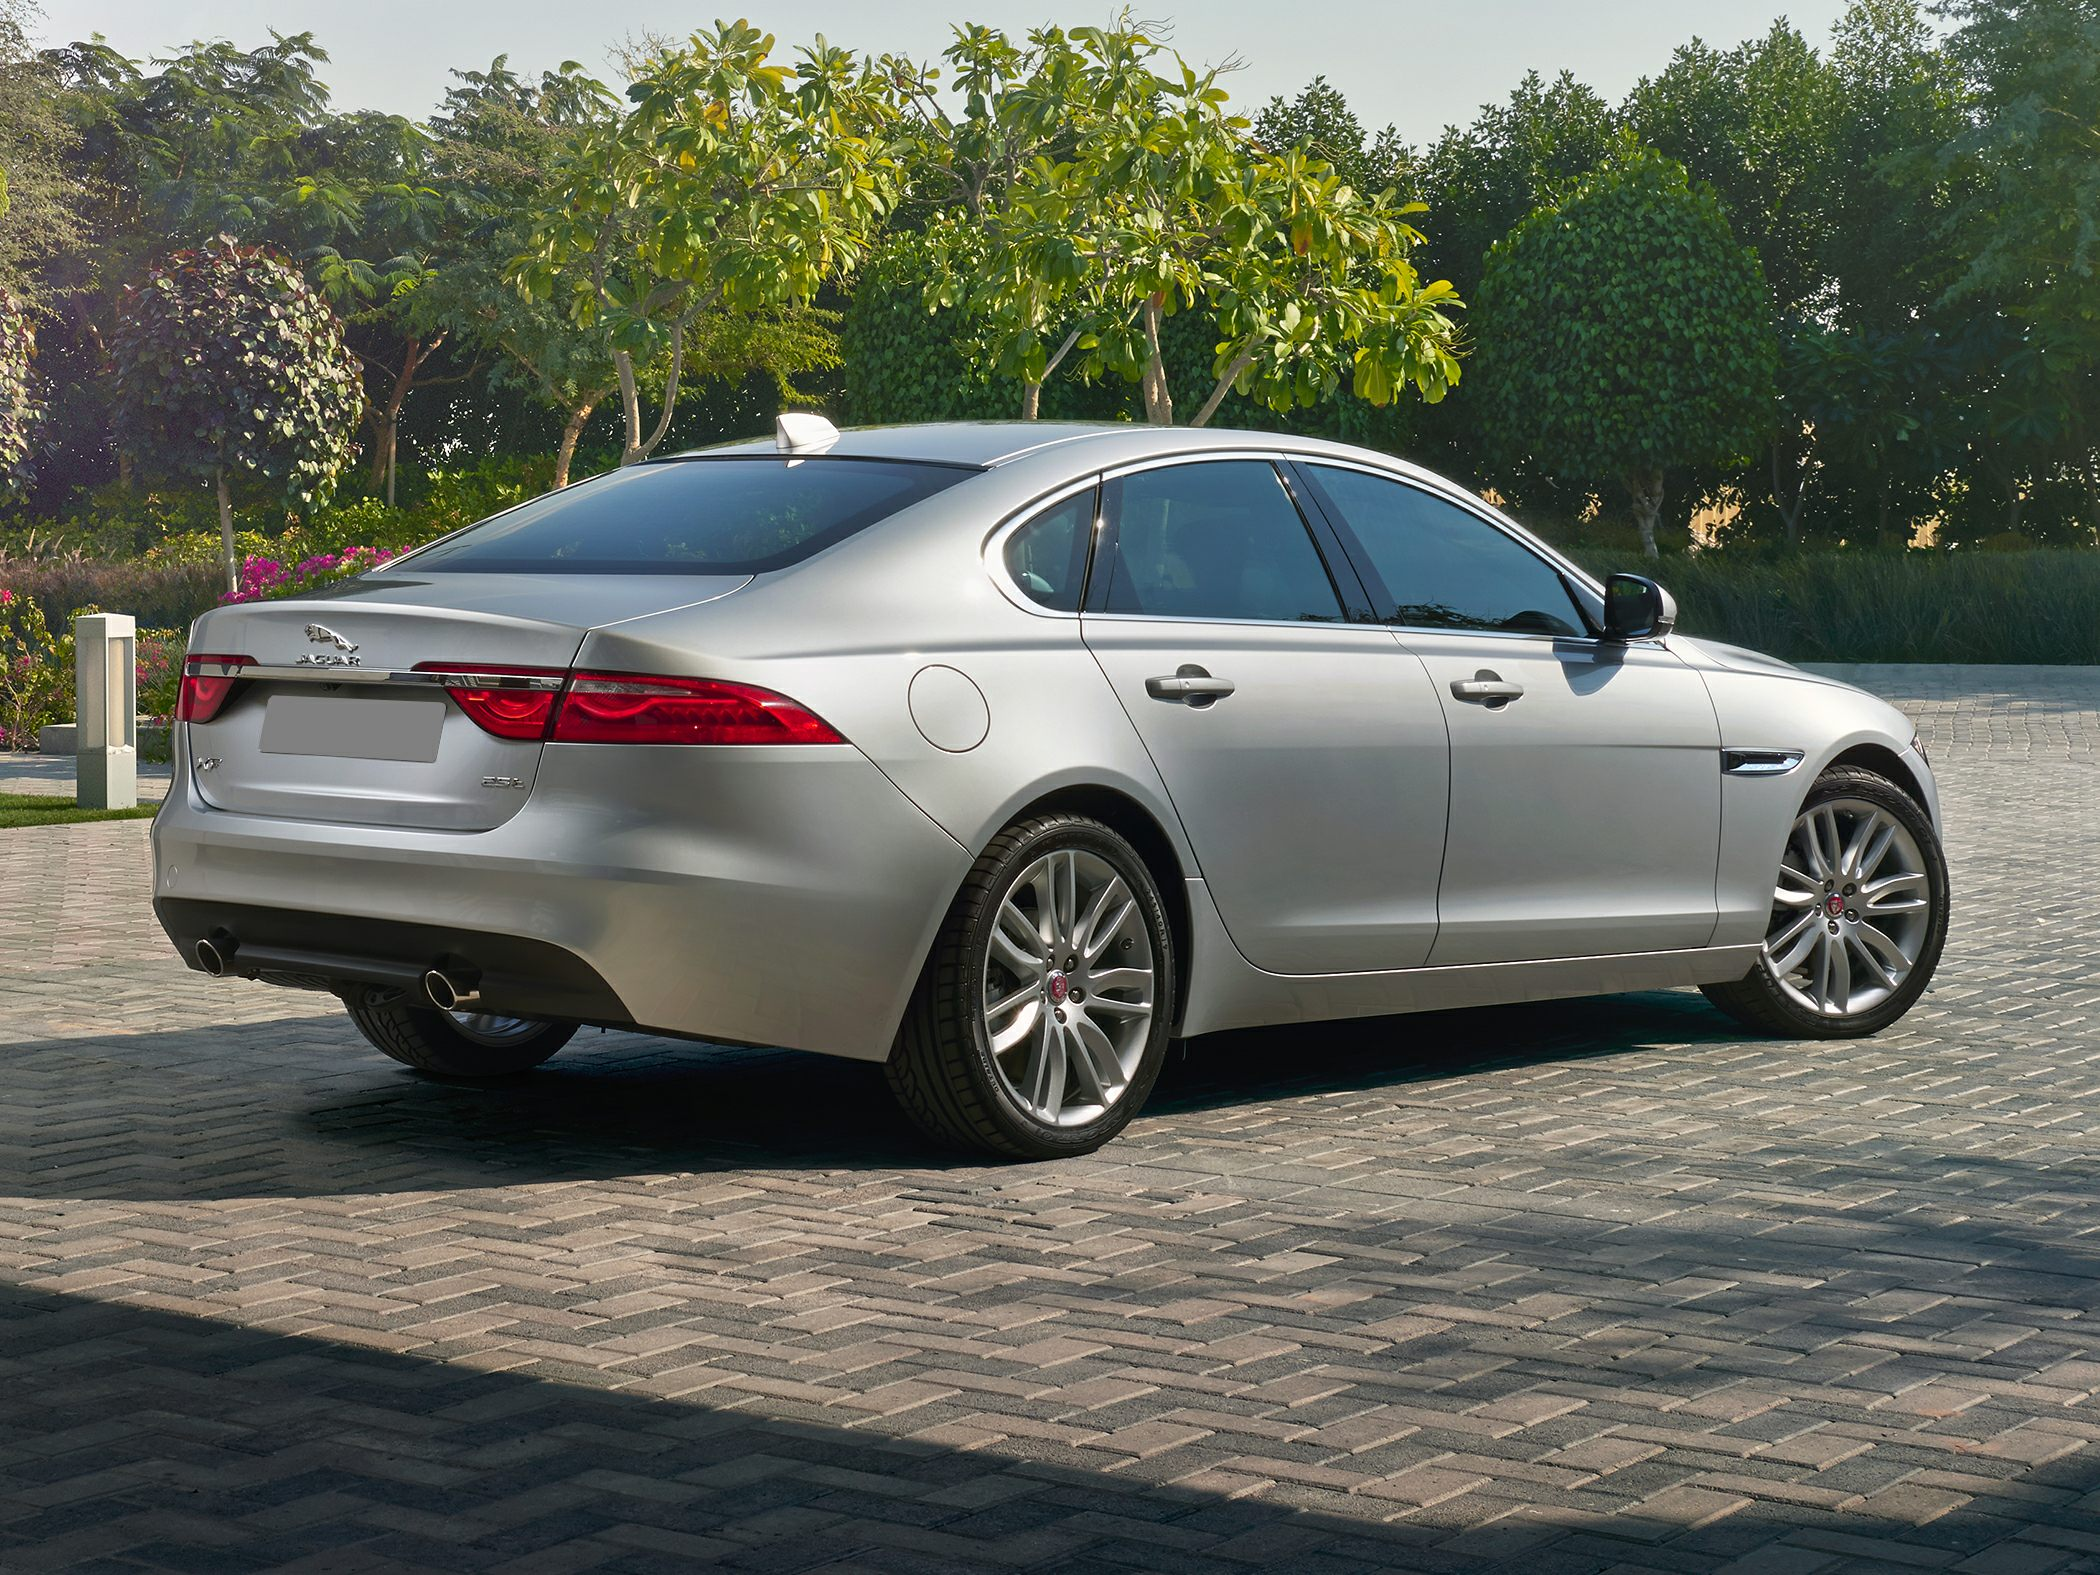 2017 jaguar xf deals prices incentives leases overview carsdirect. Black Bedroom Furniture Sets. Home Design Ideas